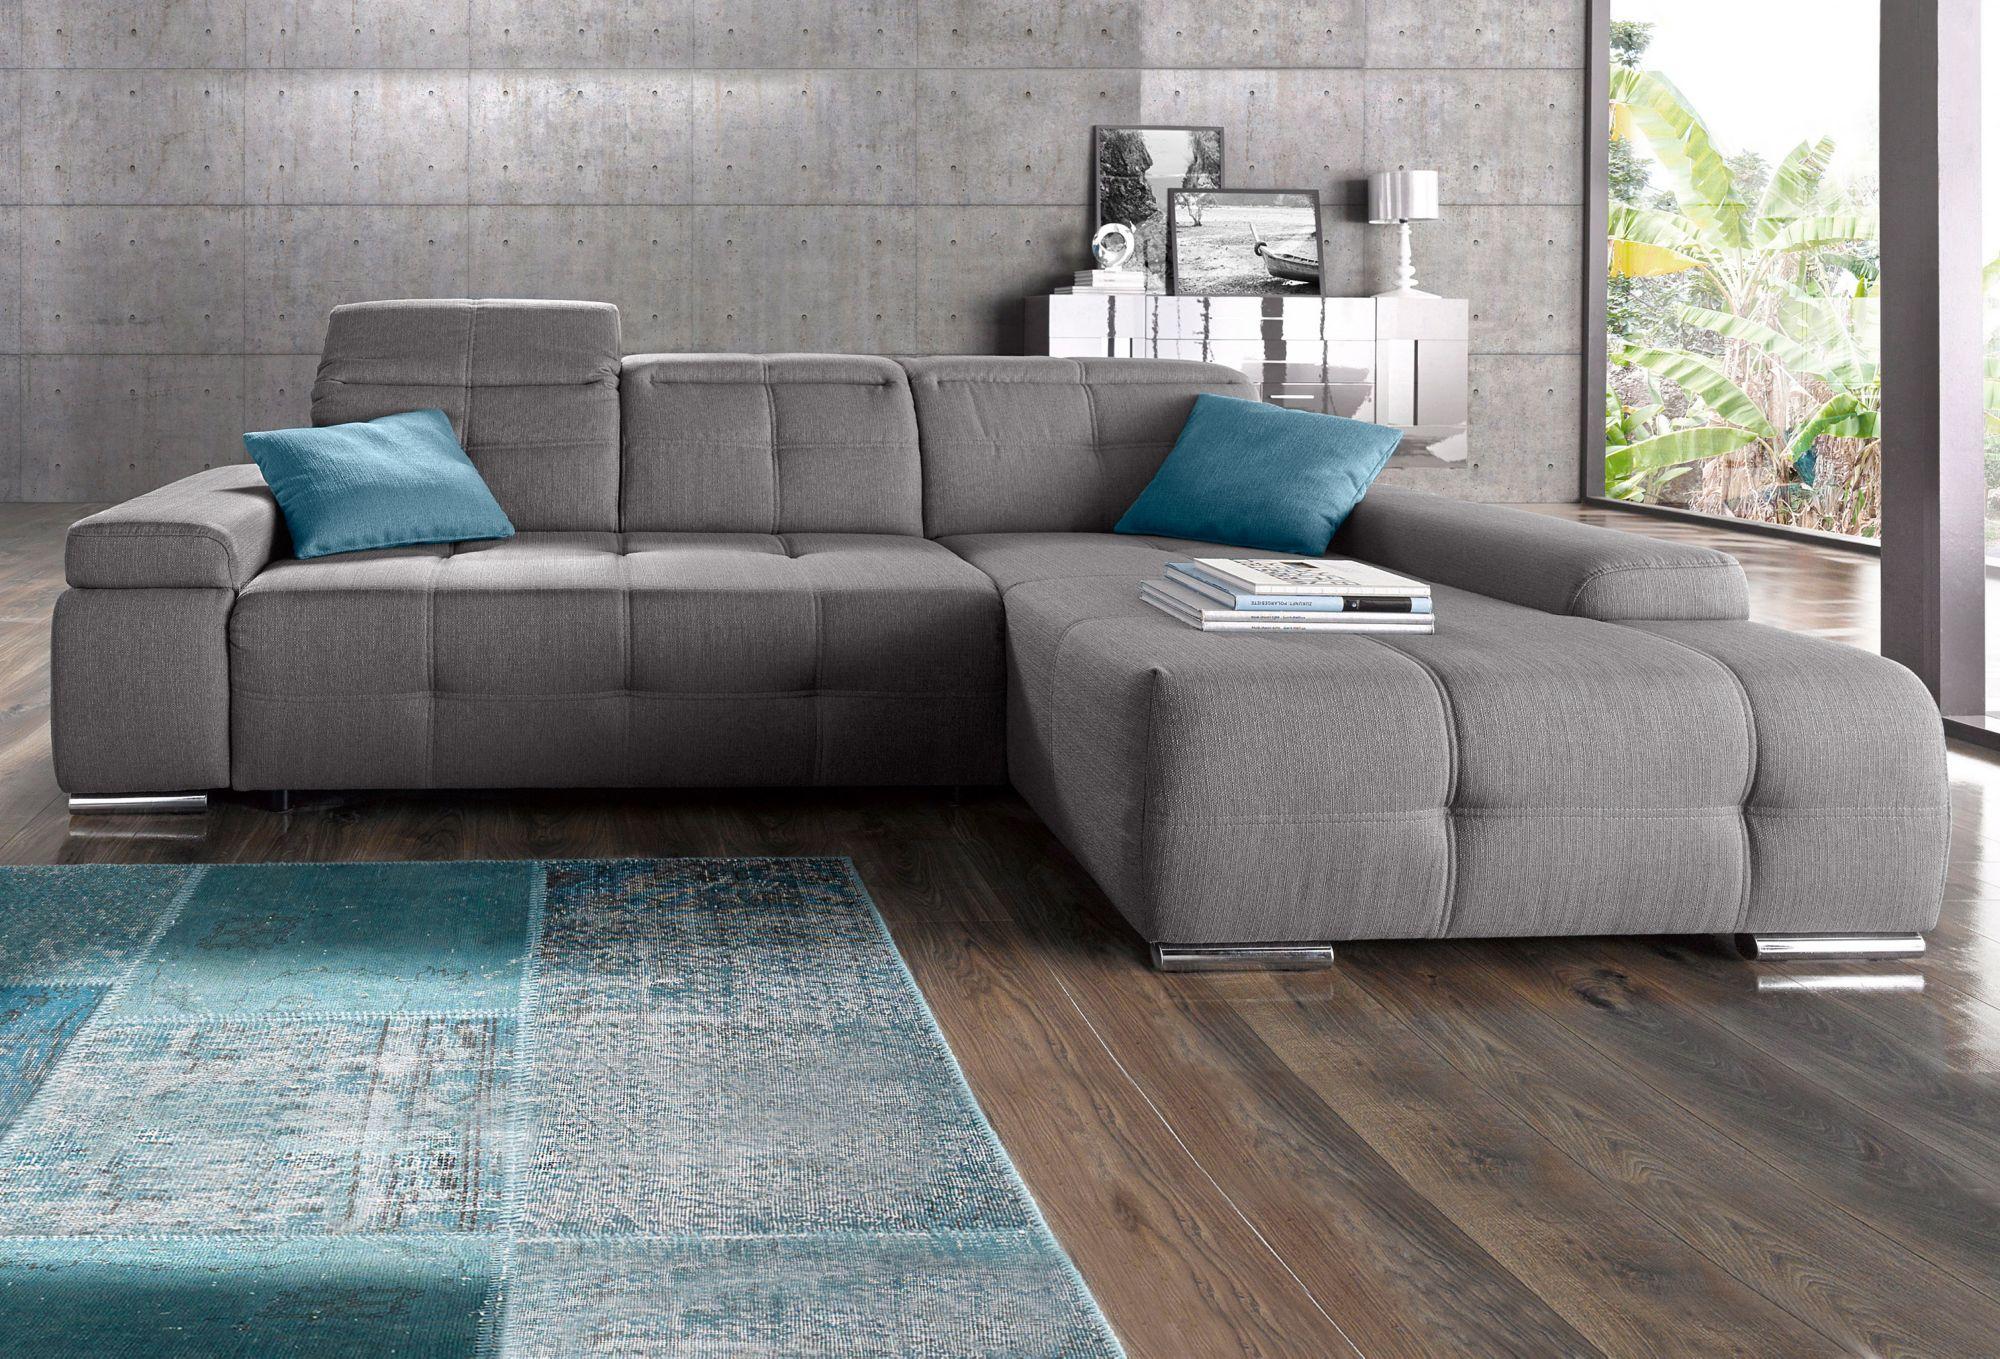 polsterecke sit more wahlweise mit bettfunktion schwab versand polsterecken. Black Bedroom Furniture Sets. Home Design Ideas